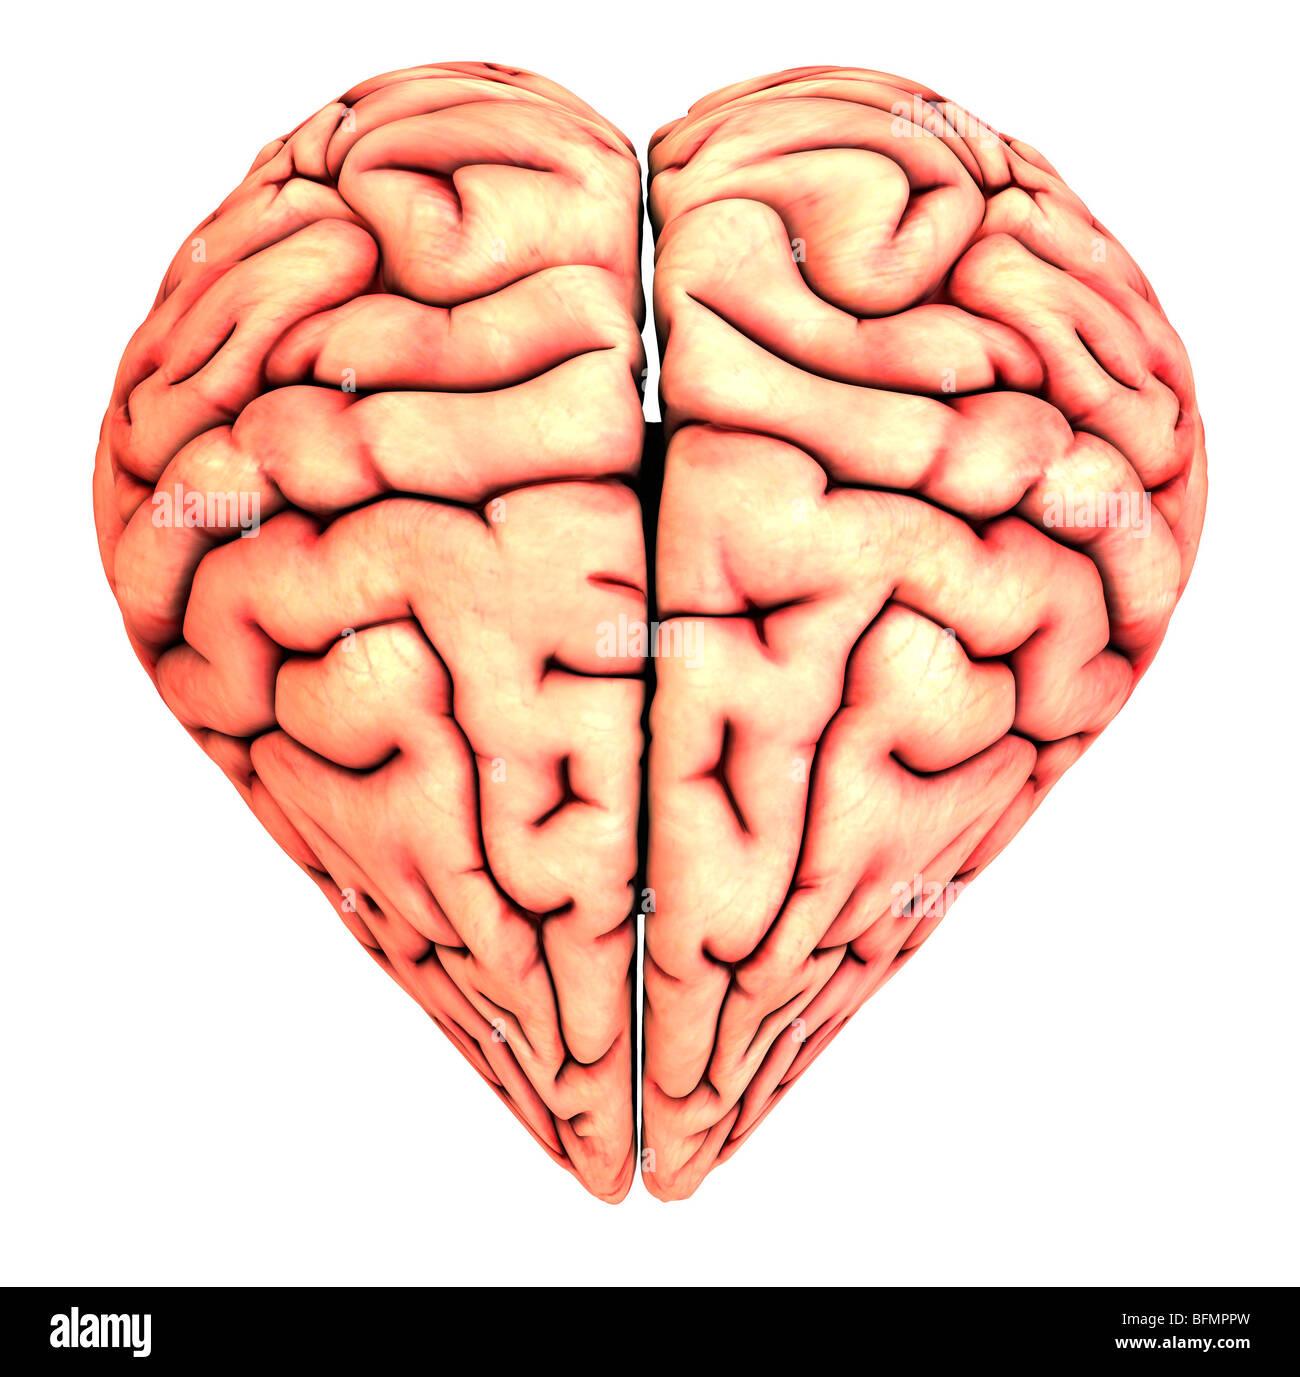 Heart-shaped brain, conceptual artwork Stock Photo: 26887137 - Alamy